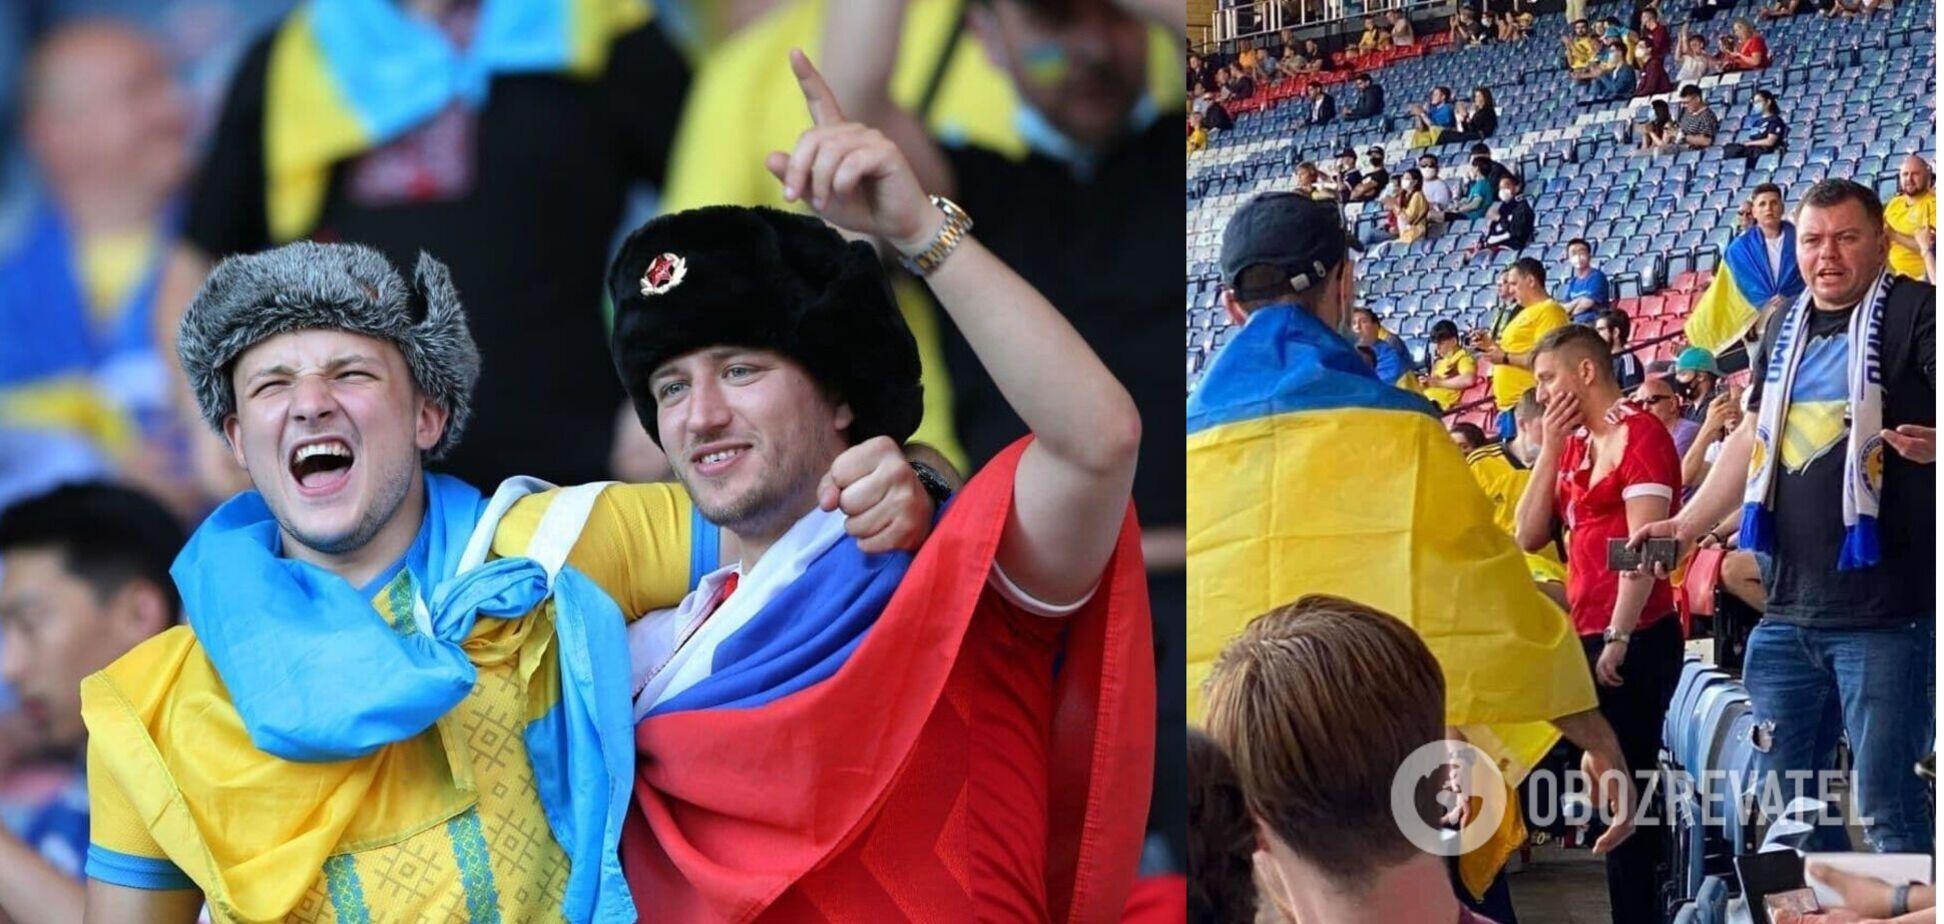 Українським фанатам не сподобався образ росіянина